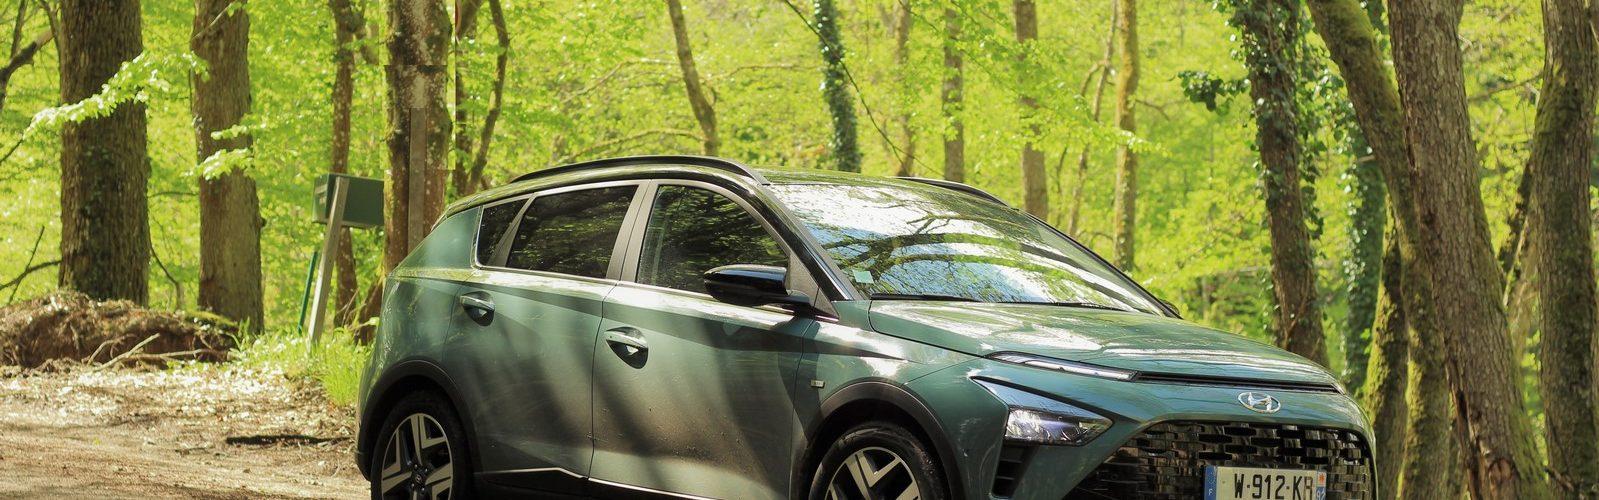 Essai Hyundai Bayon Le Nouvel Automobiliste 53